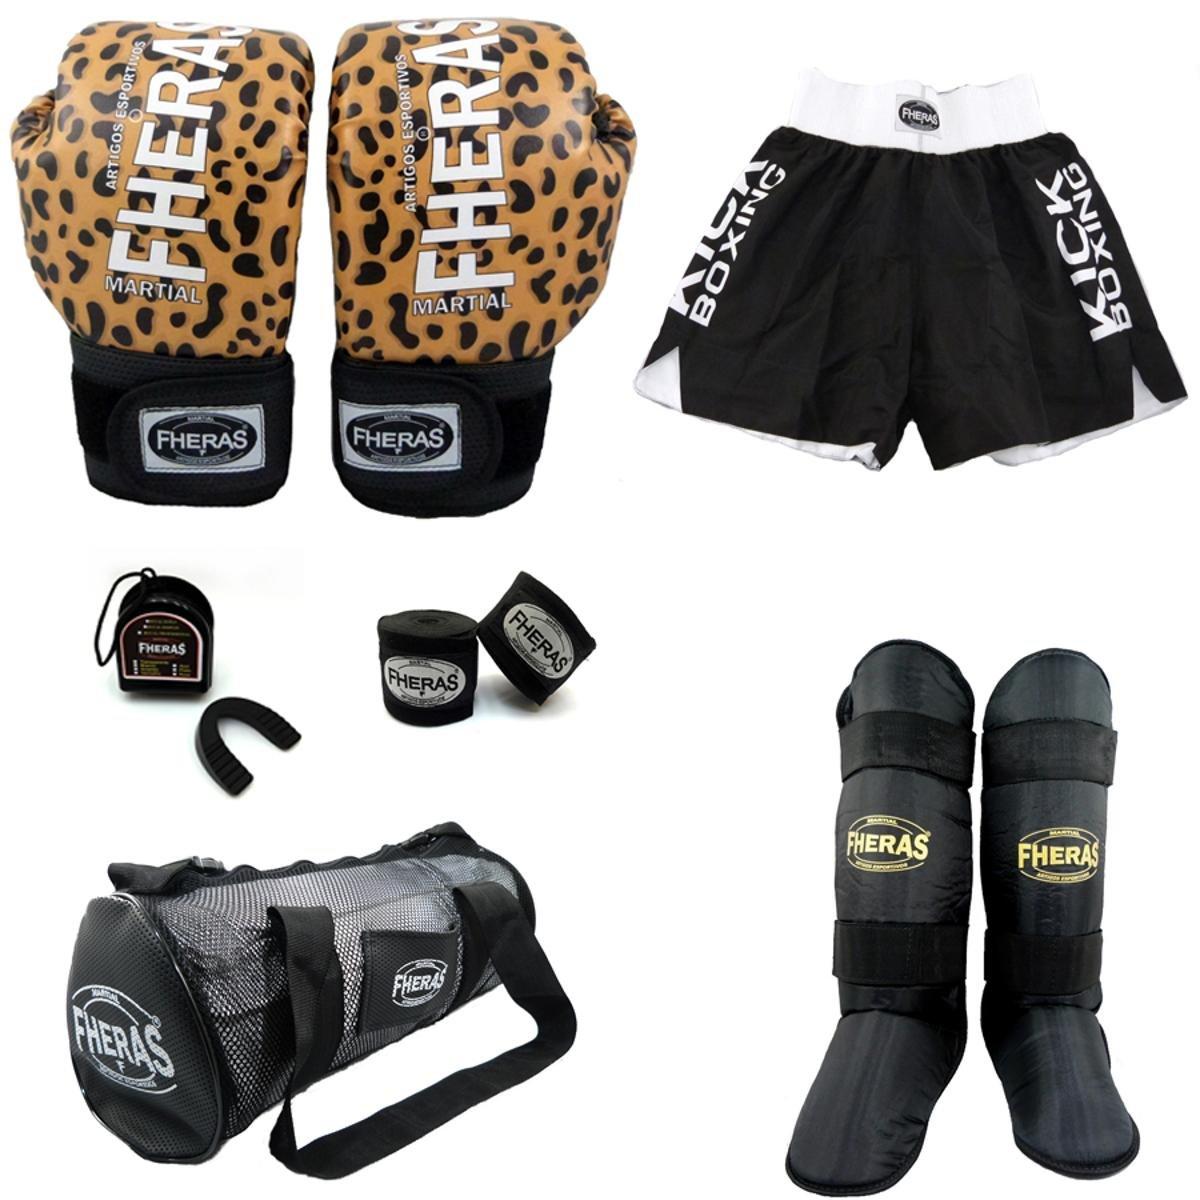 Kit Boxe Fheras Top Luva Bandagem Bucal Caneleira Bolsa Shorts 12 OZ Onça  ... 65b4224b71ea4